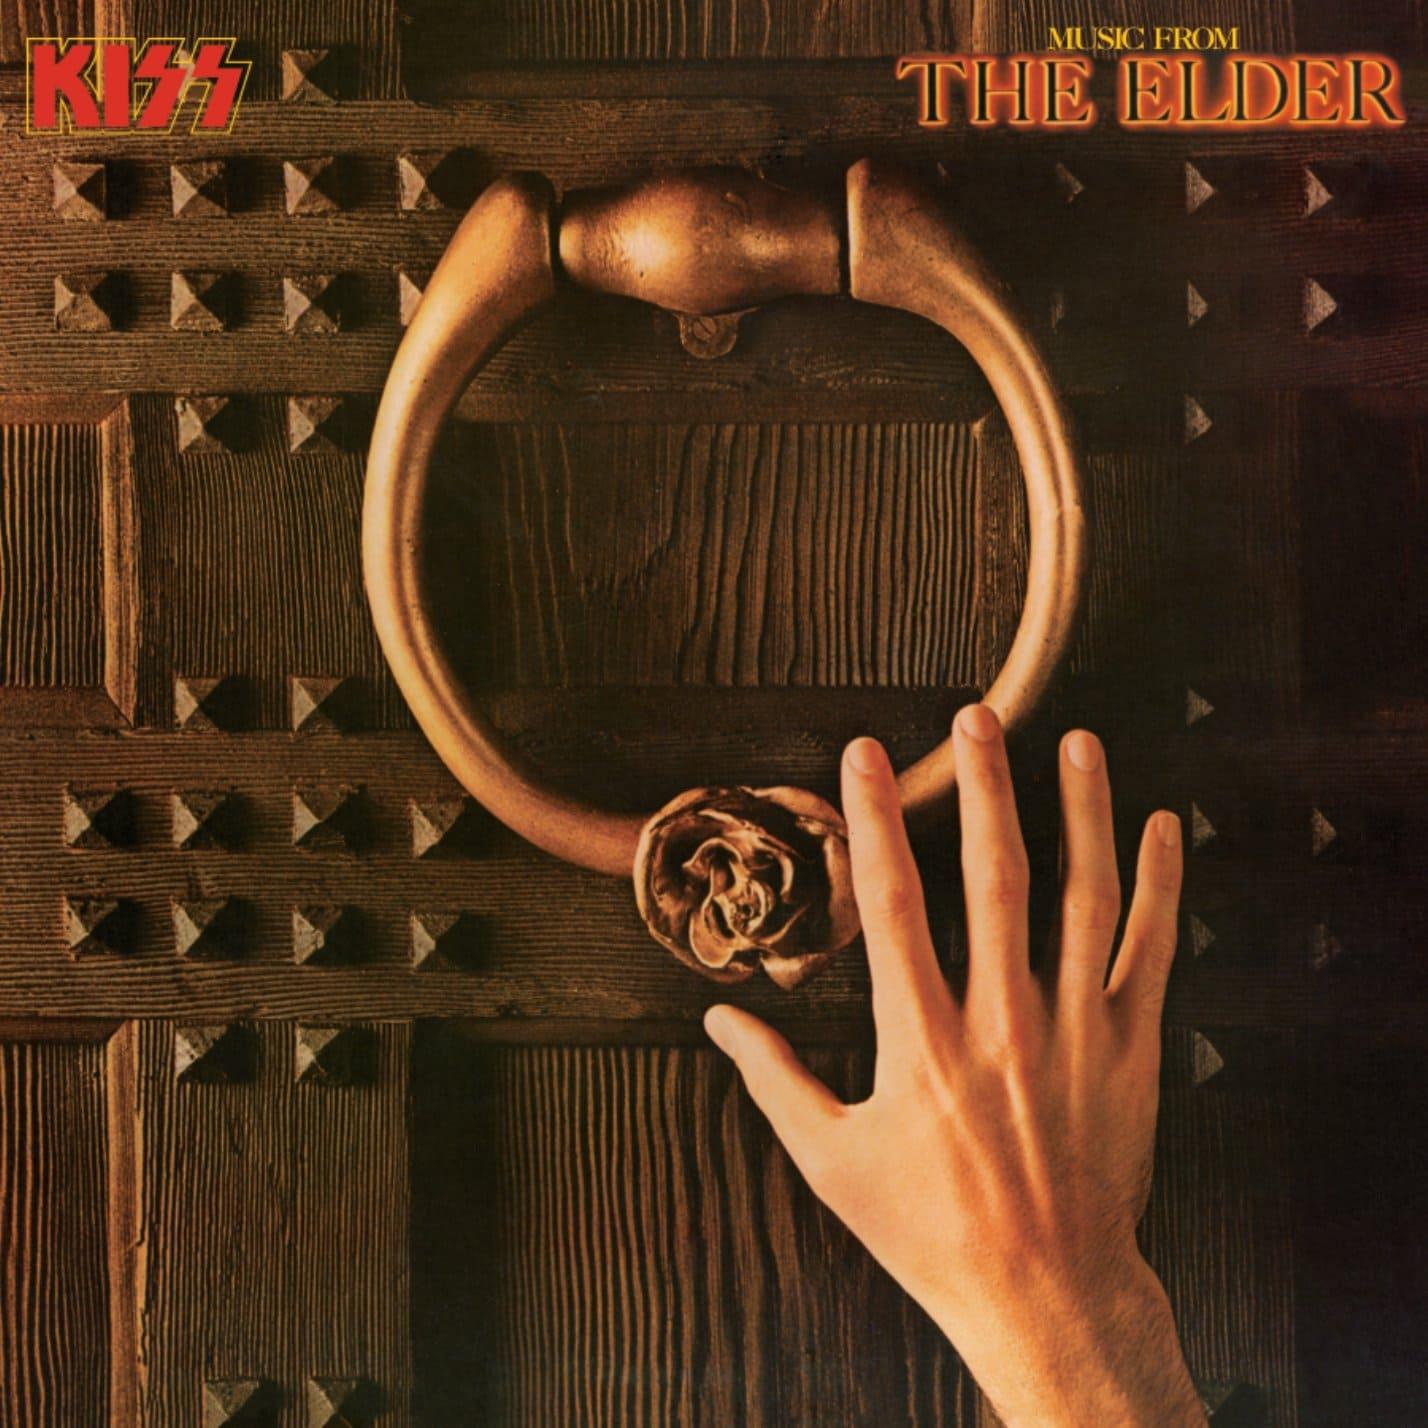 Music Fro The Elder Kiss